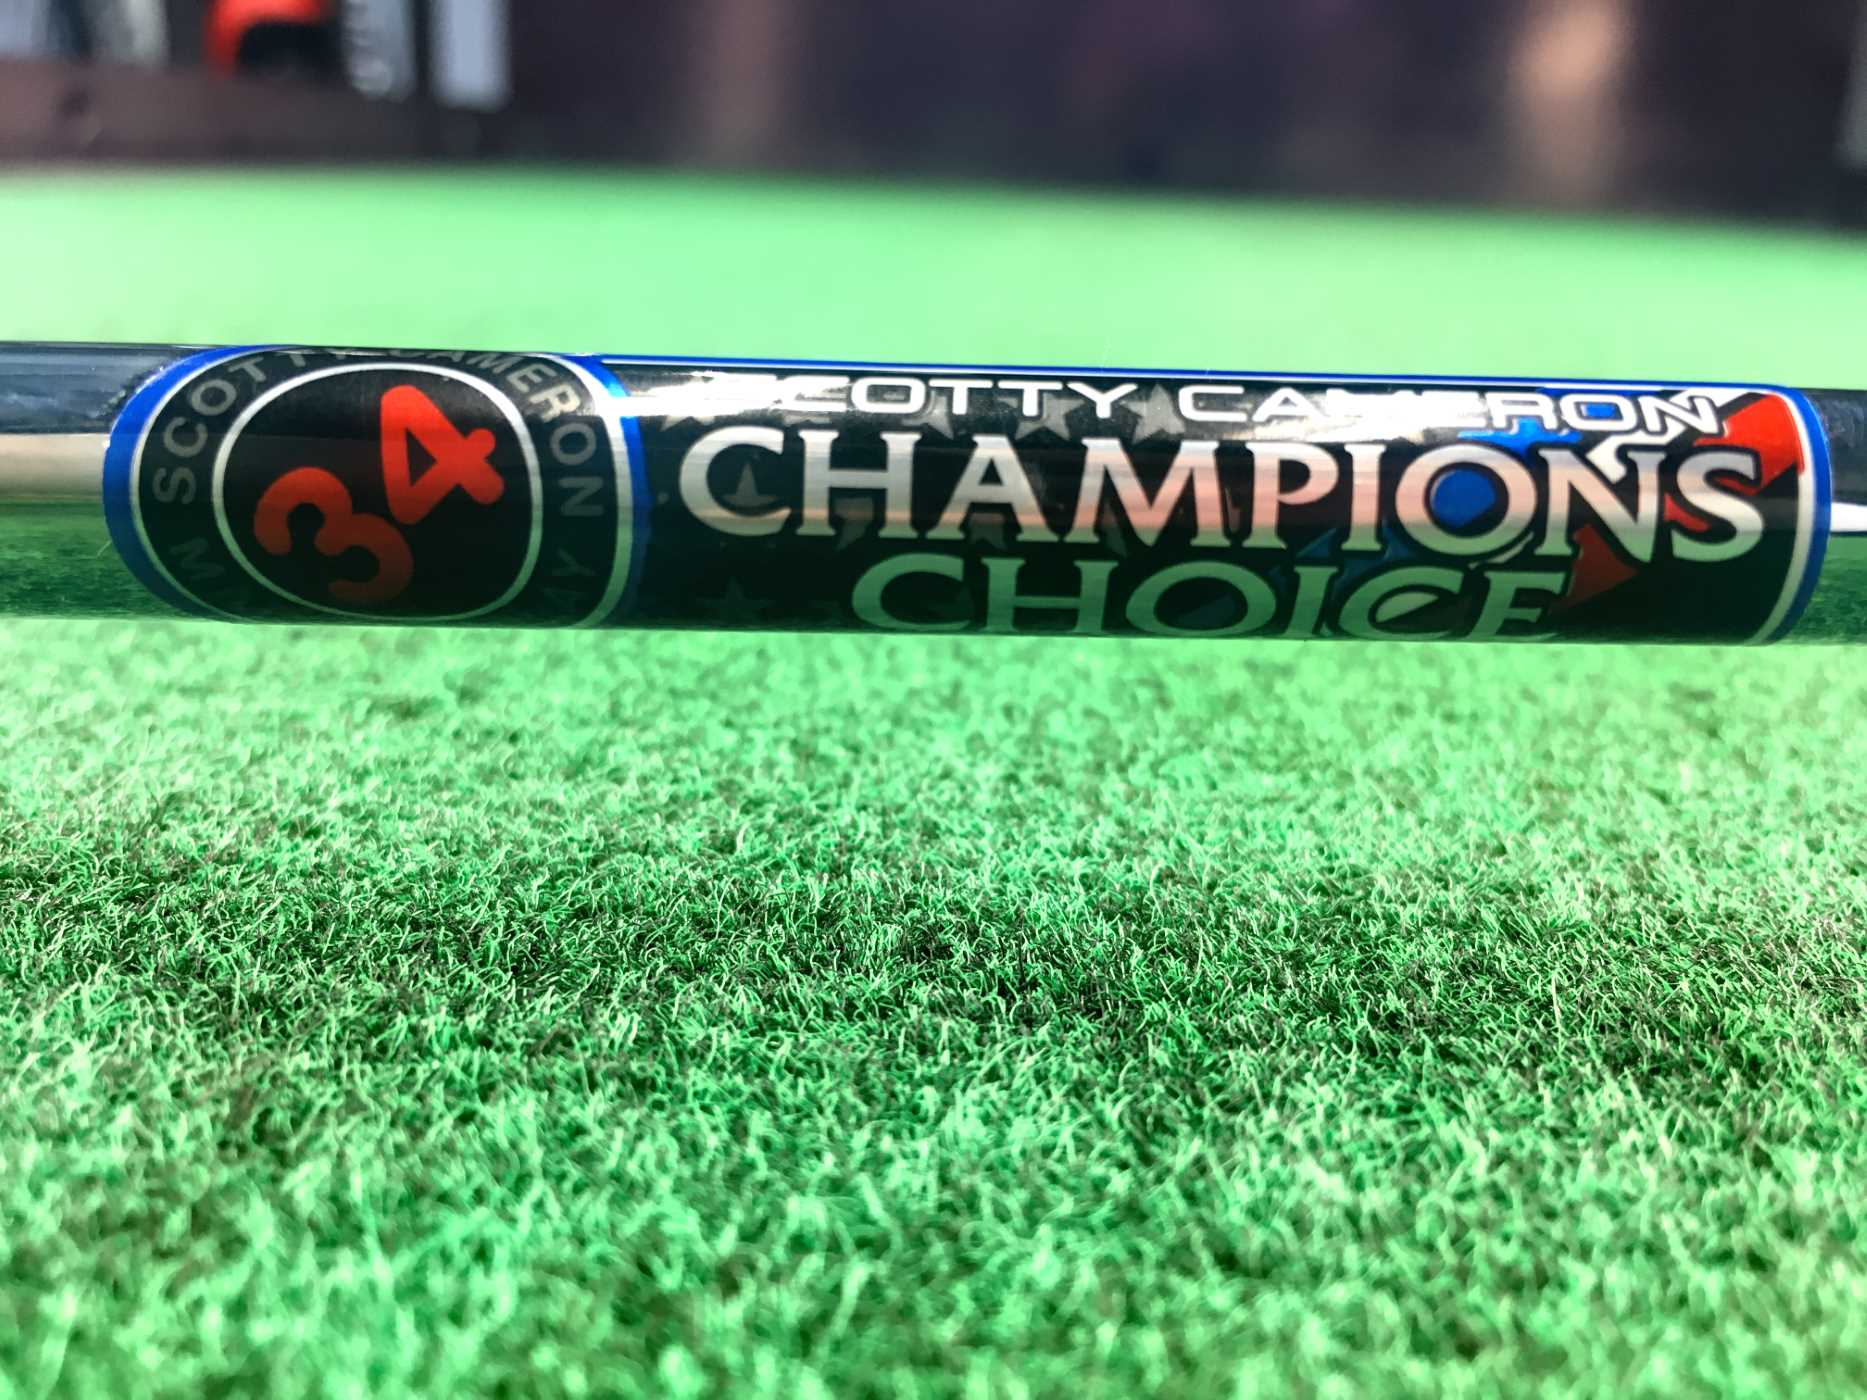 Scotty Cameron Champions Choice Putter